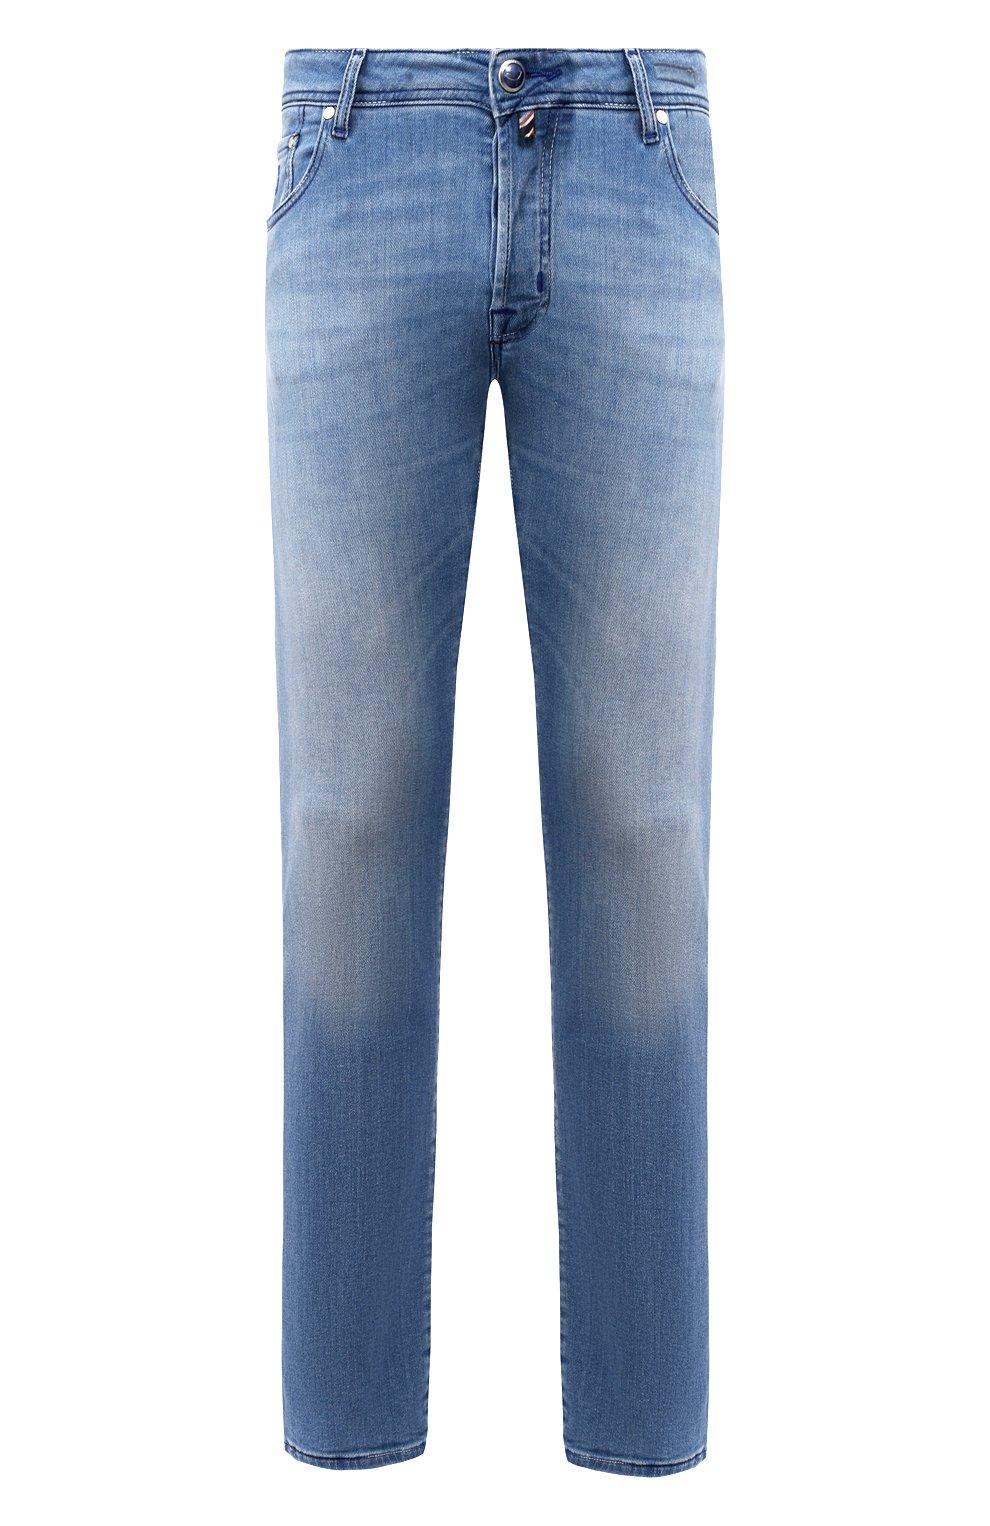 Мужские джинсы JACOB COHEN голубого цвета, арт. J688 C0MF 01855-W3/53 | Фото 1